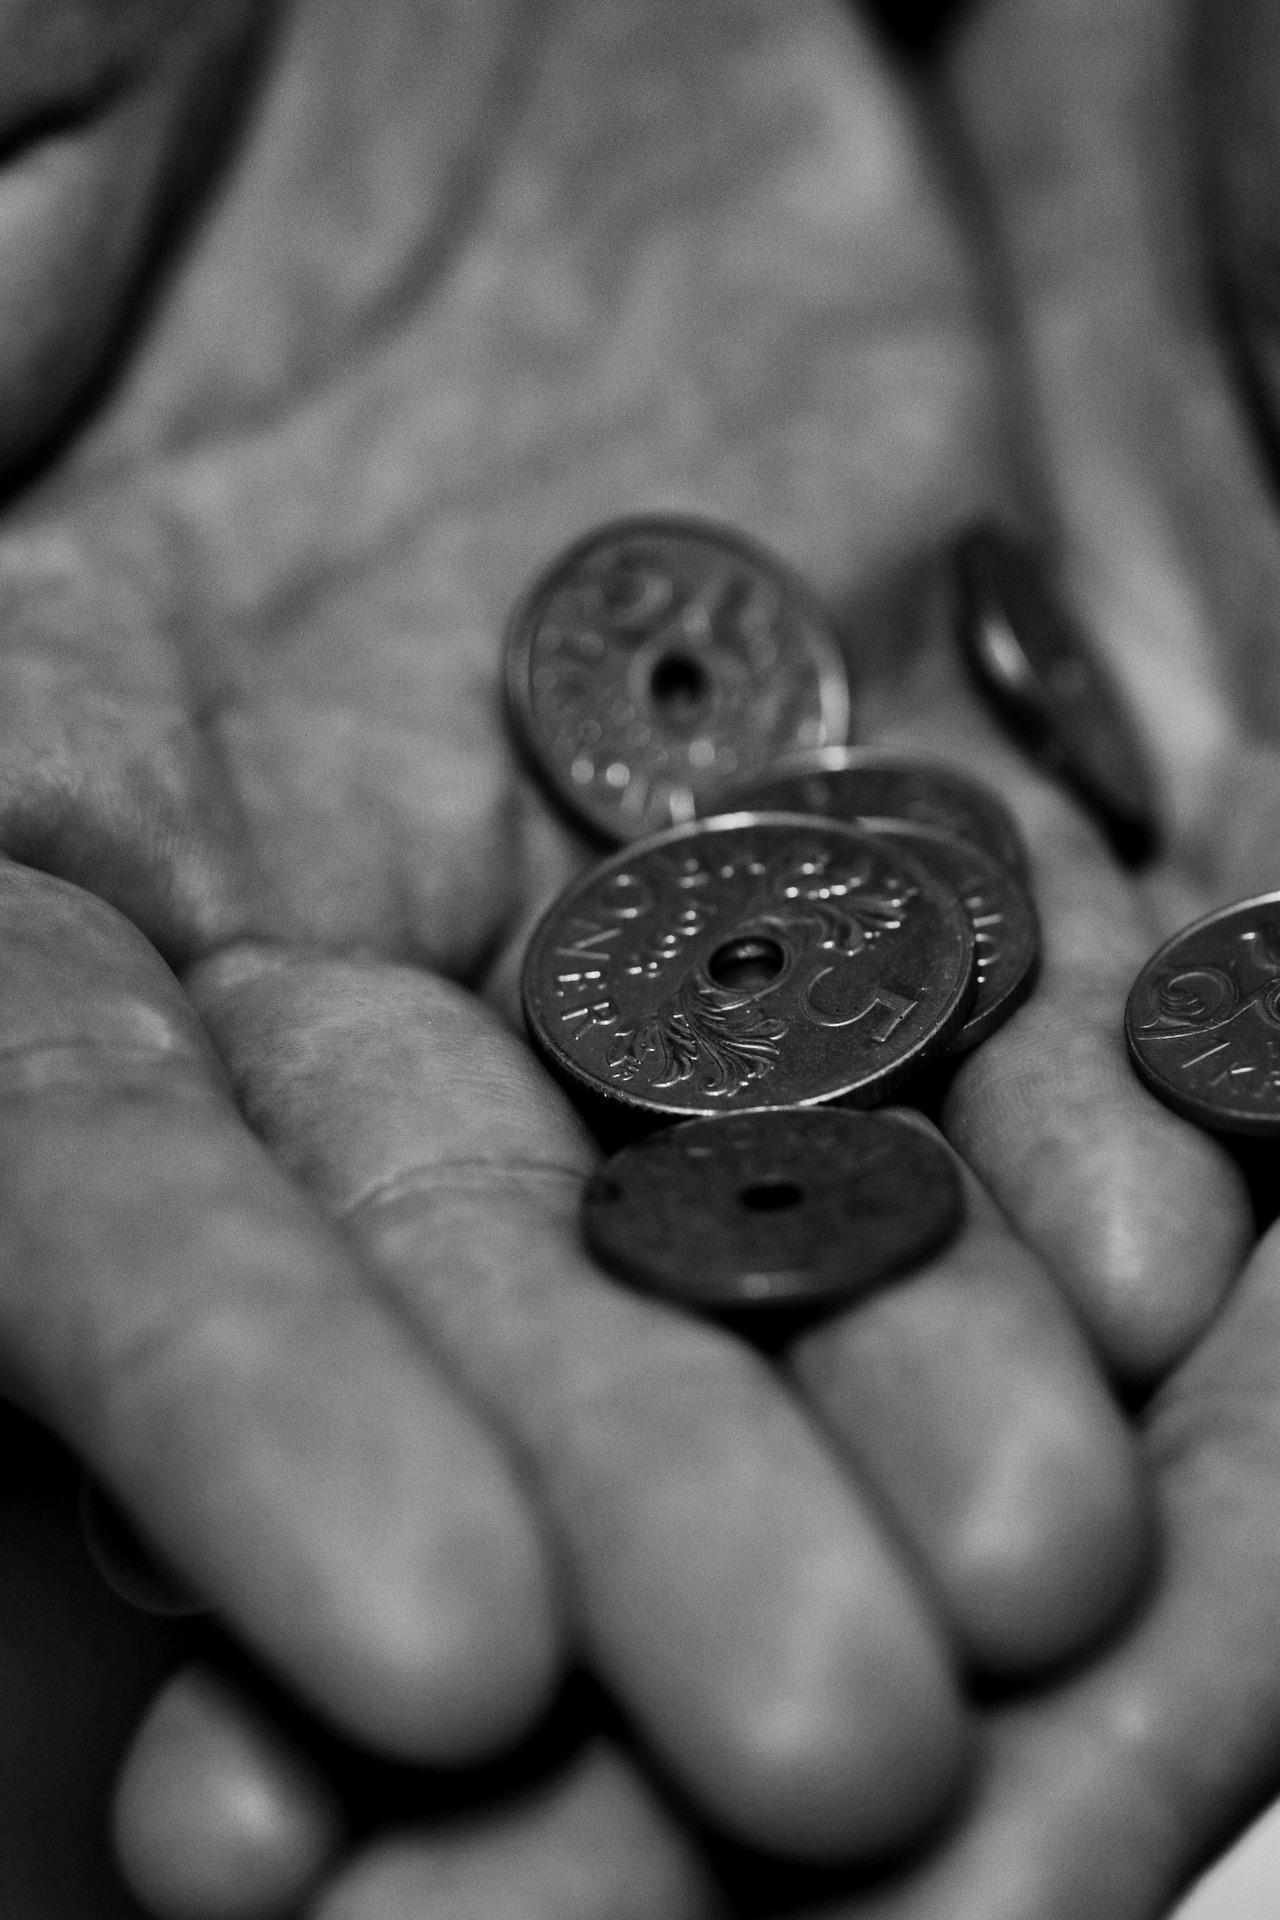 money-2340409_1920.jpg